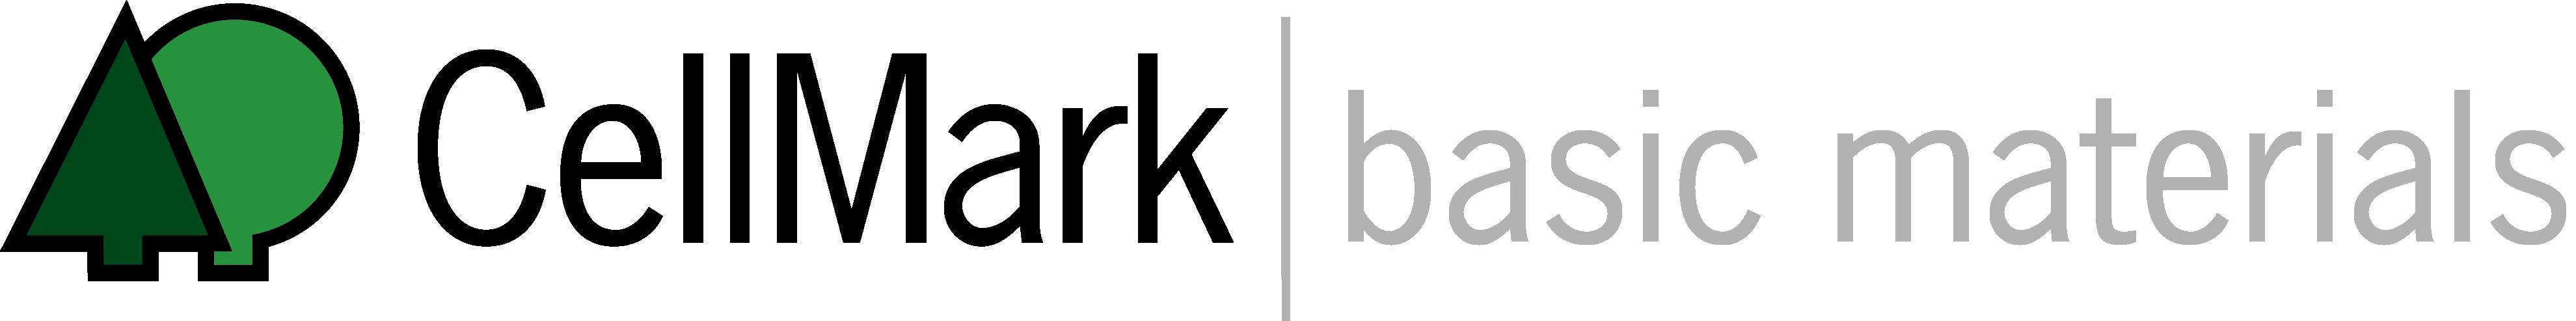 cellmark basic materials color logo